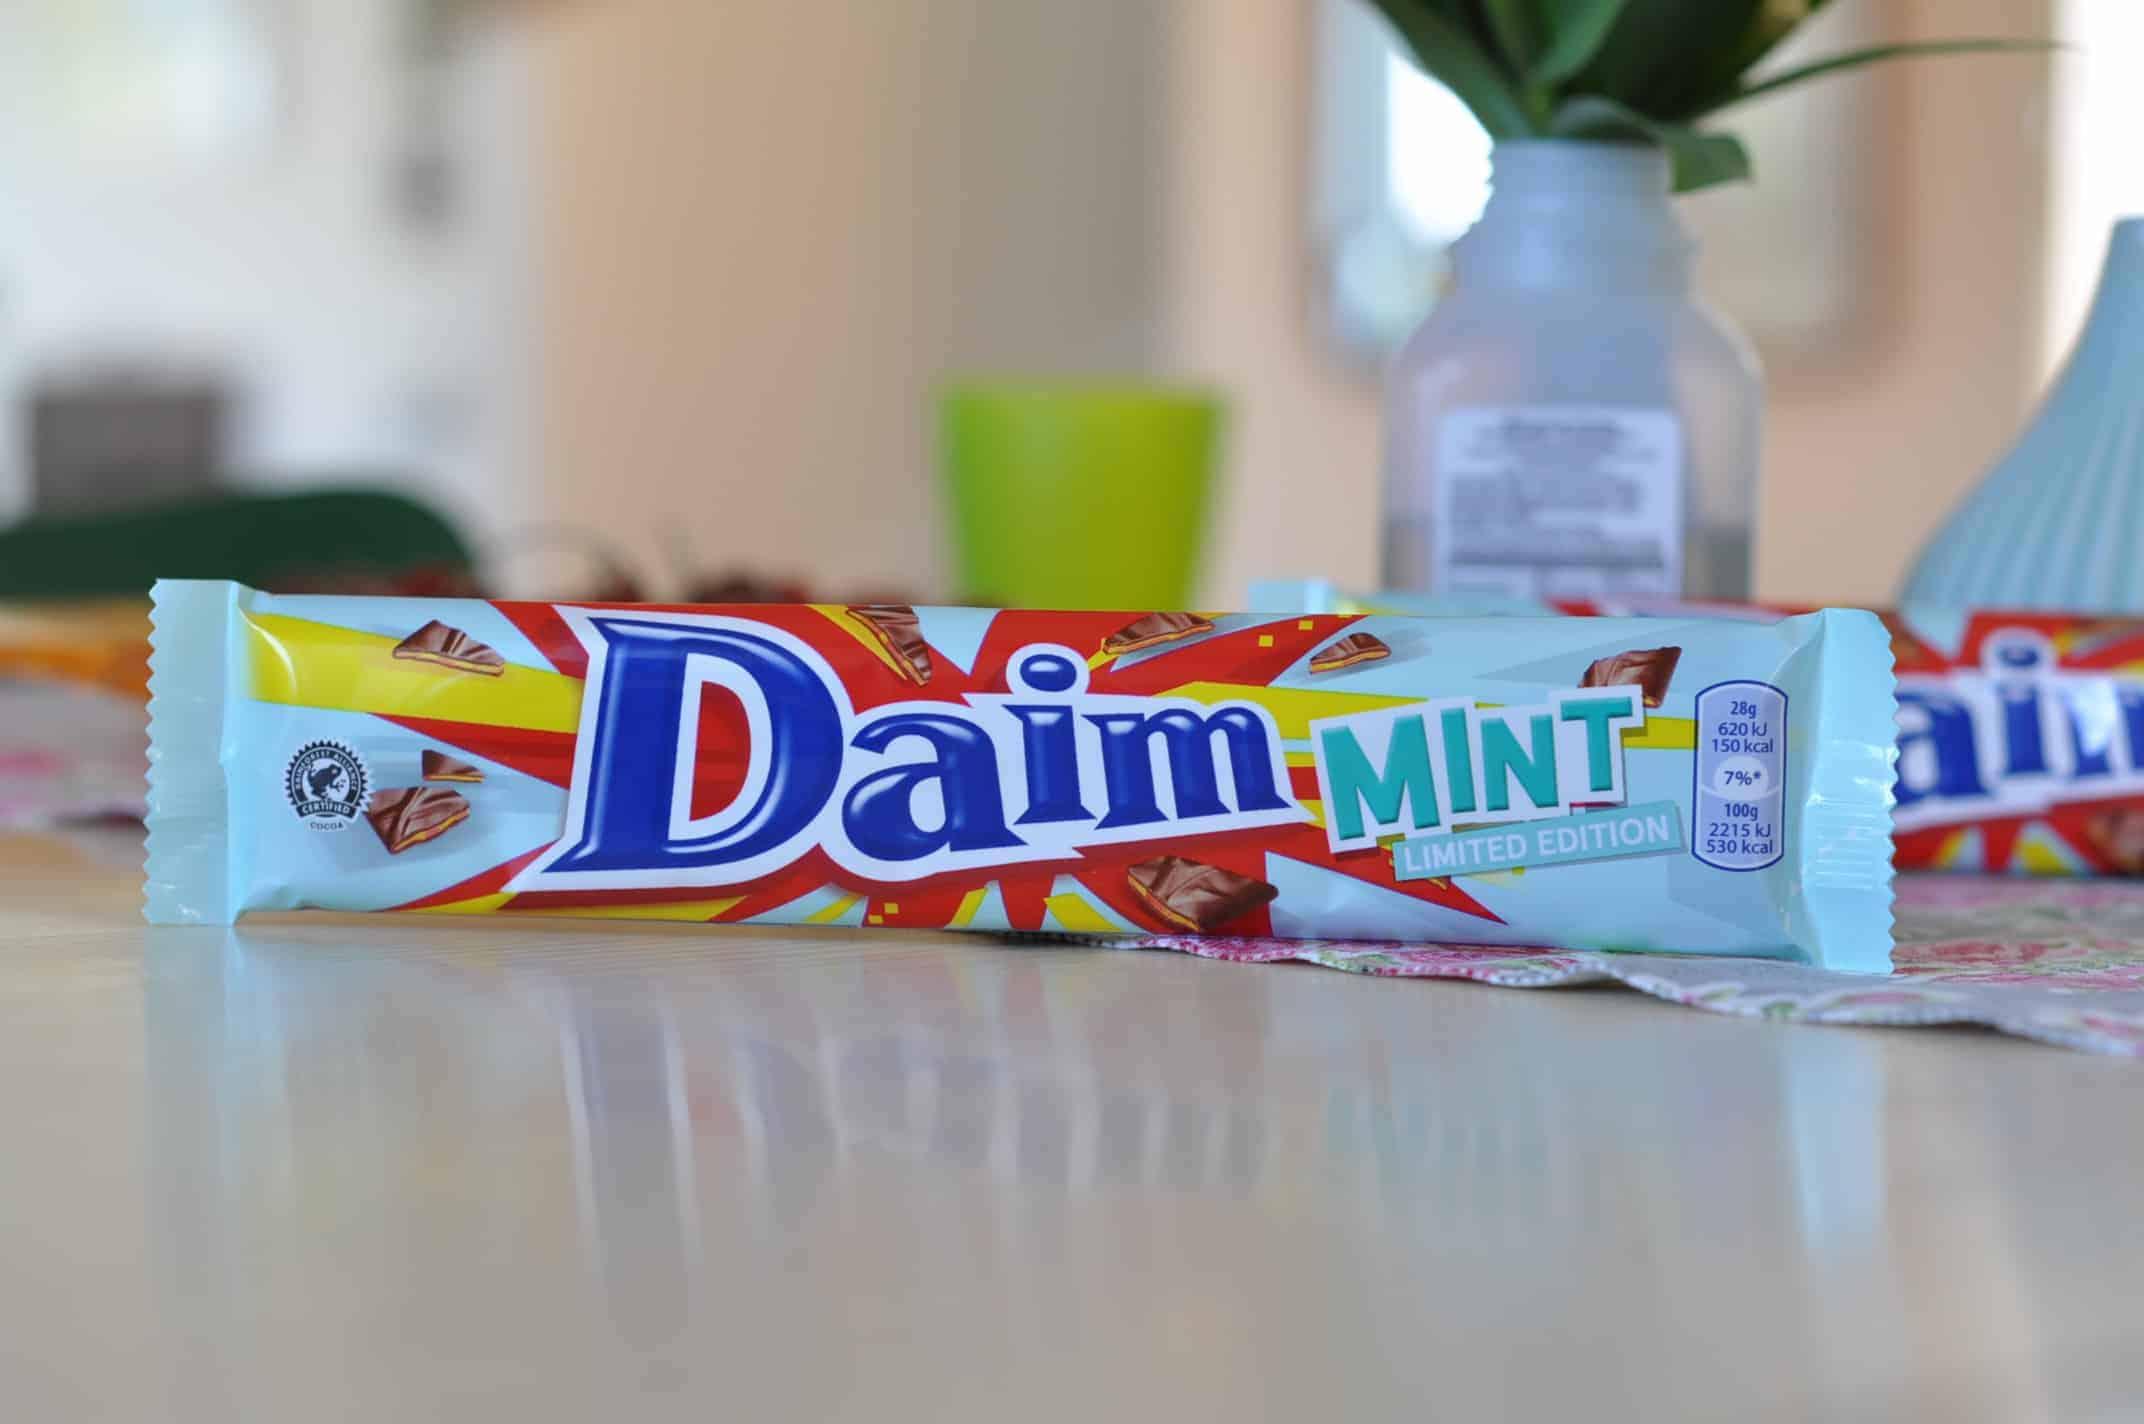 Daim Mint Limited Edition